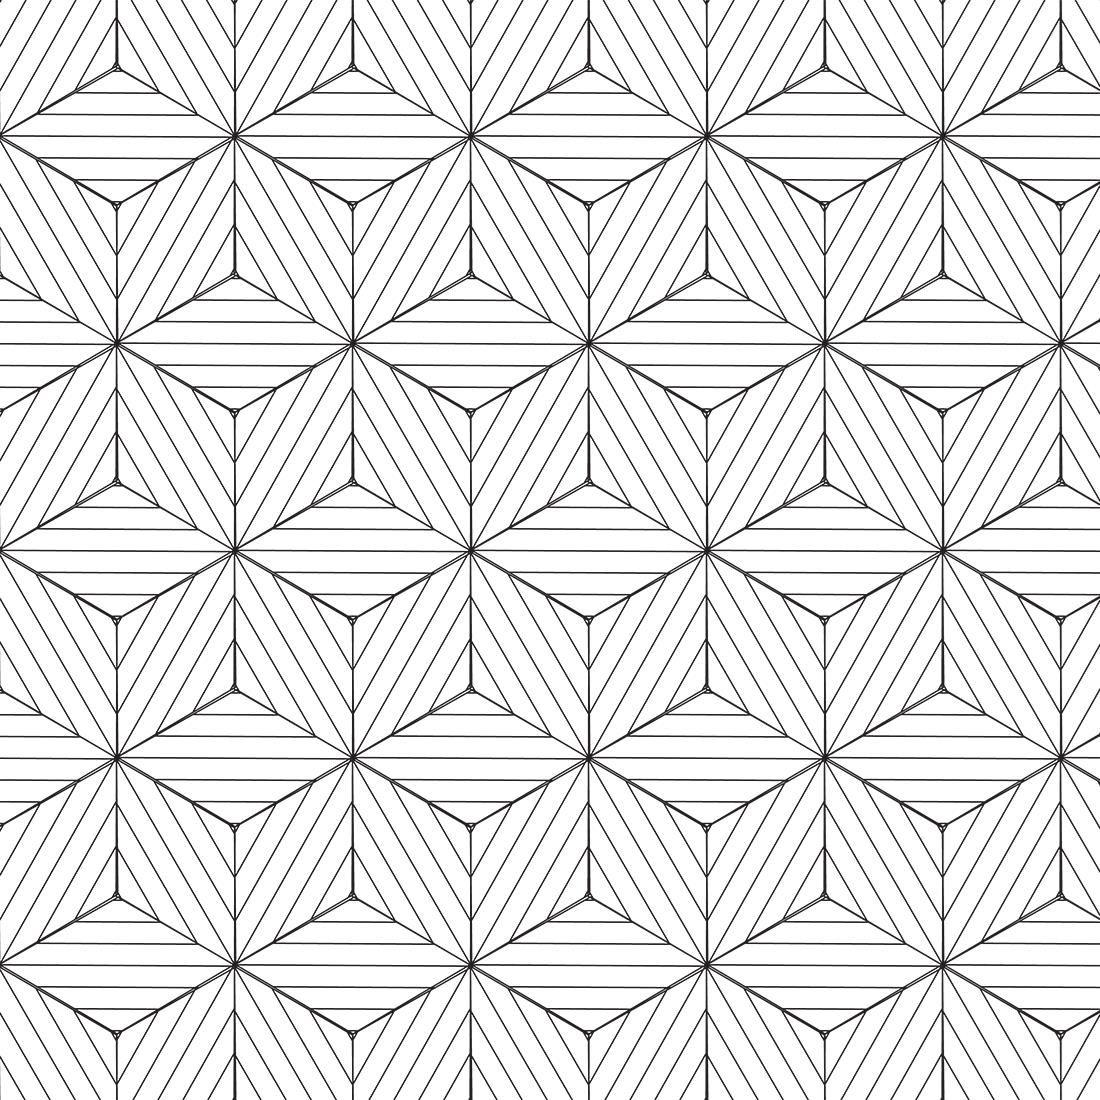 143520601 Papel de Parede Adesivo 3D Geométrico Branco e Preto 237661555 ...